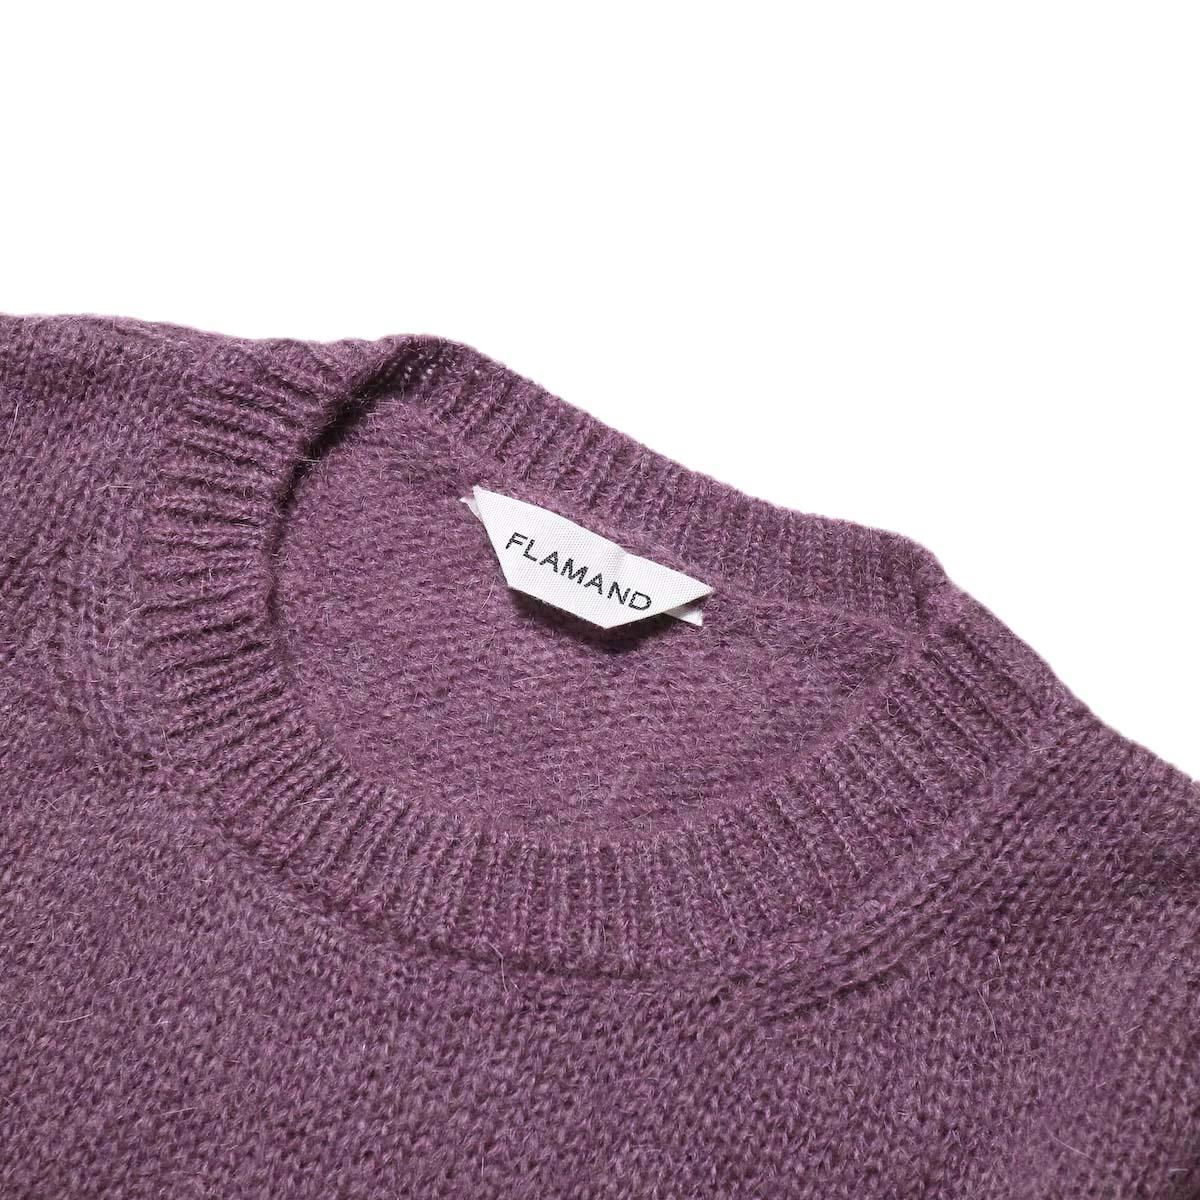 FLAMAND / Mohair Basic (Dark Lavender)クルーネック